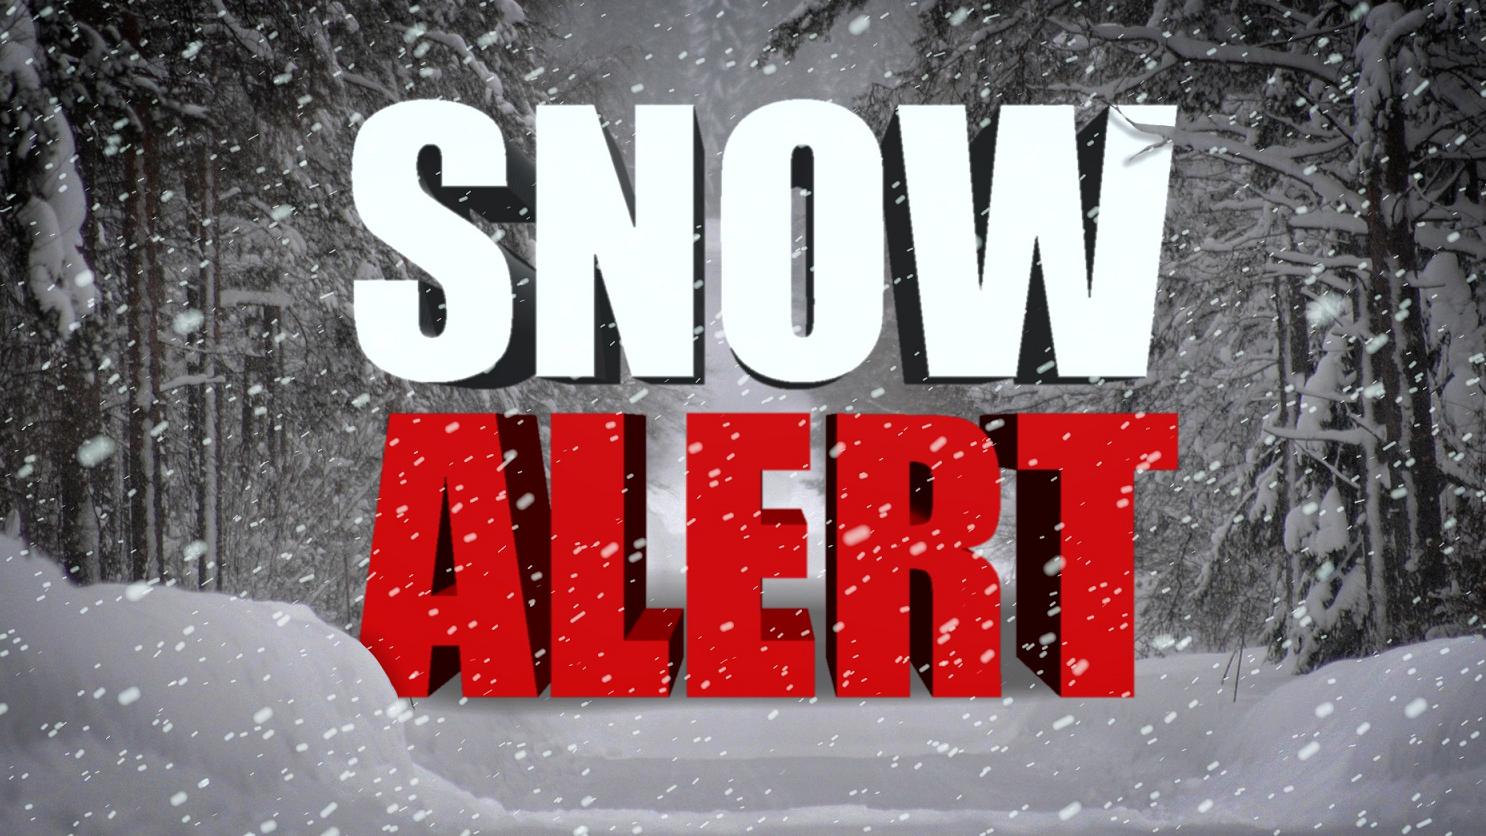 KELO Snow alert generic